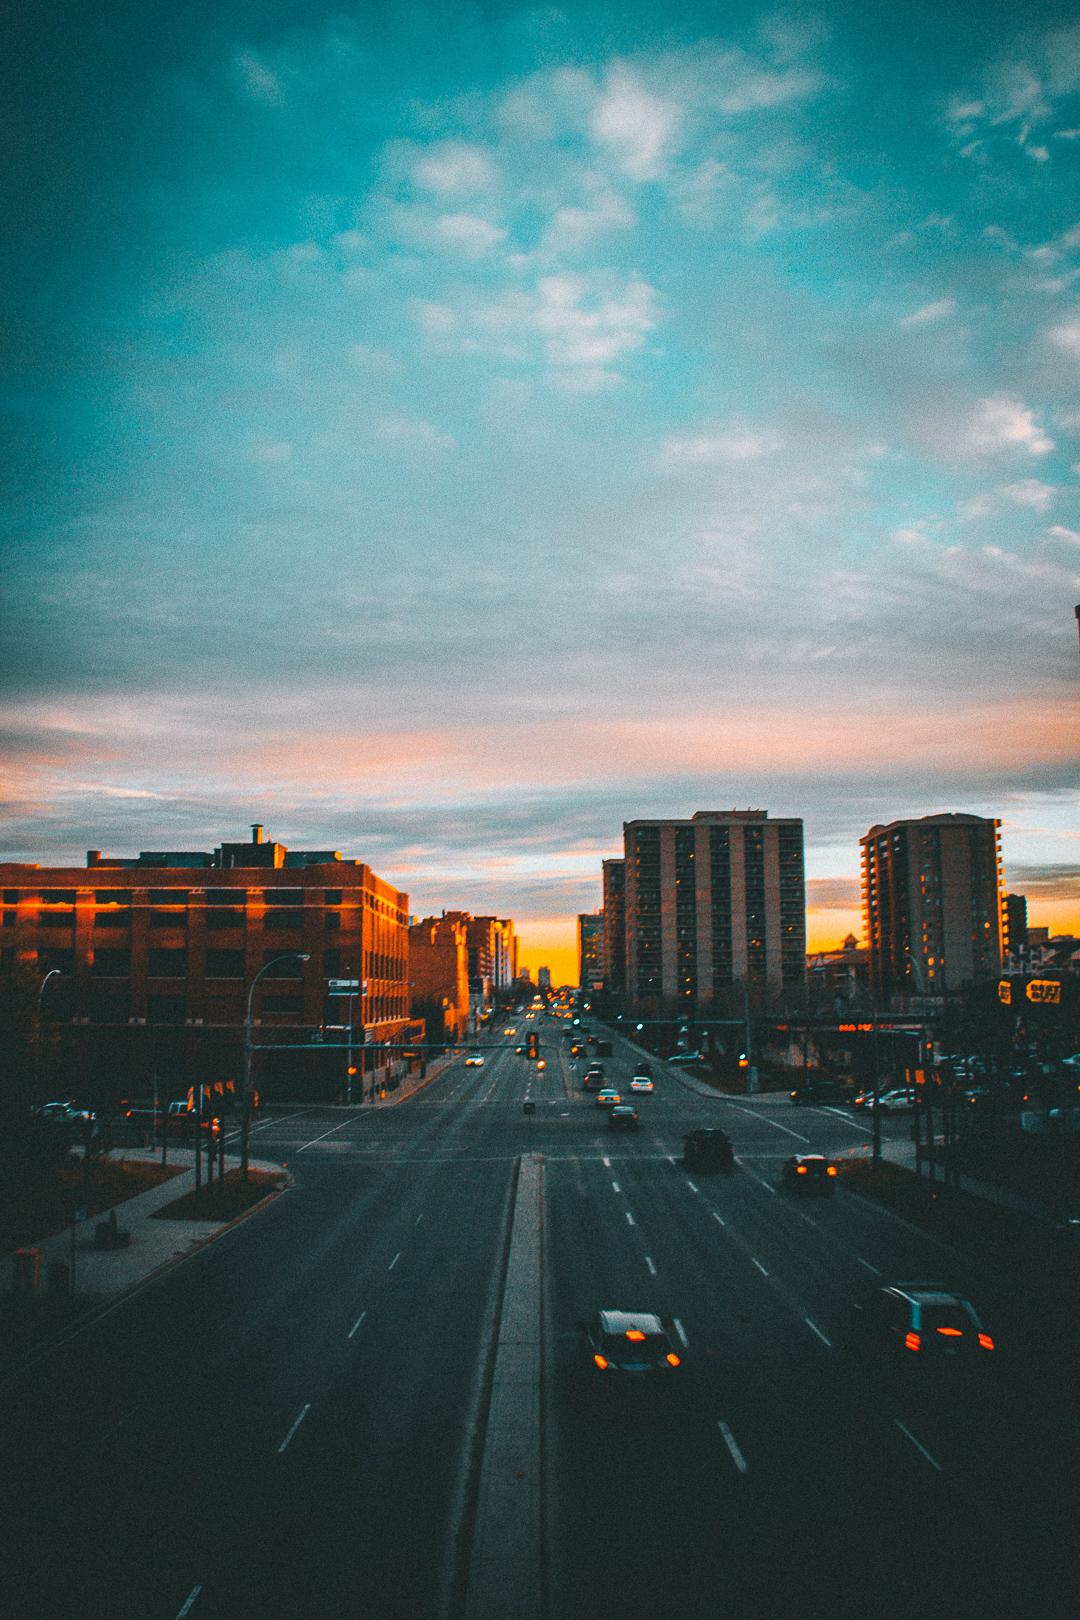 780 sunsets